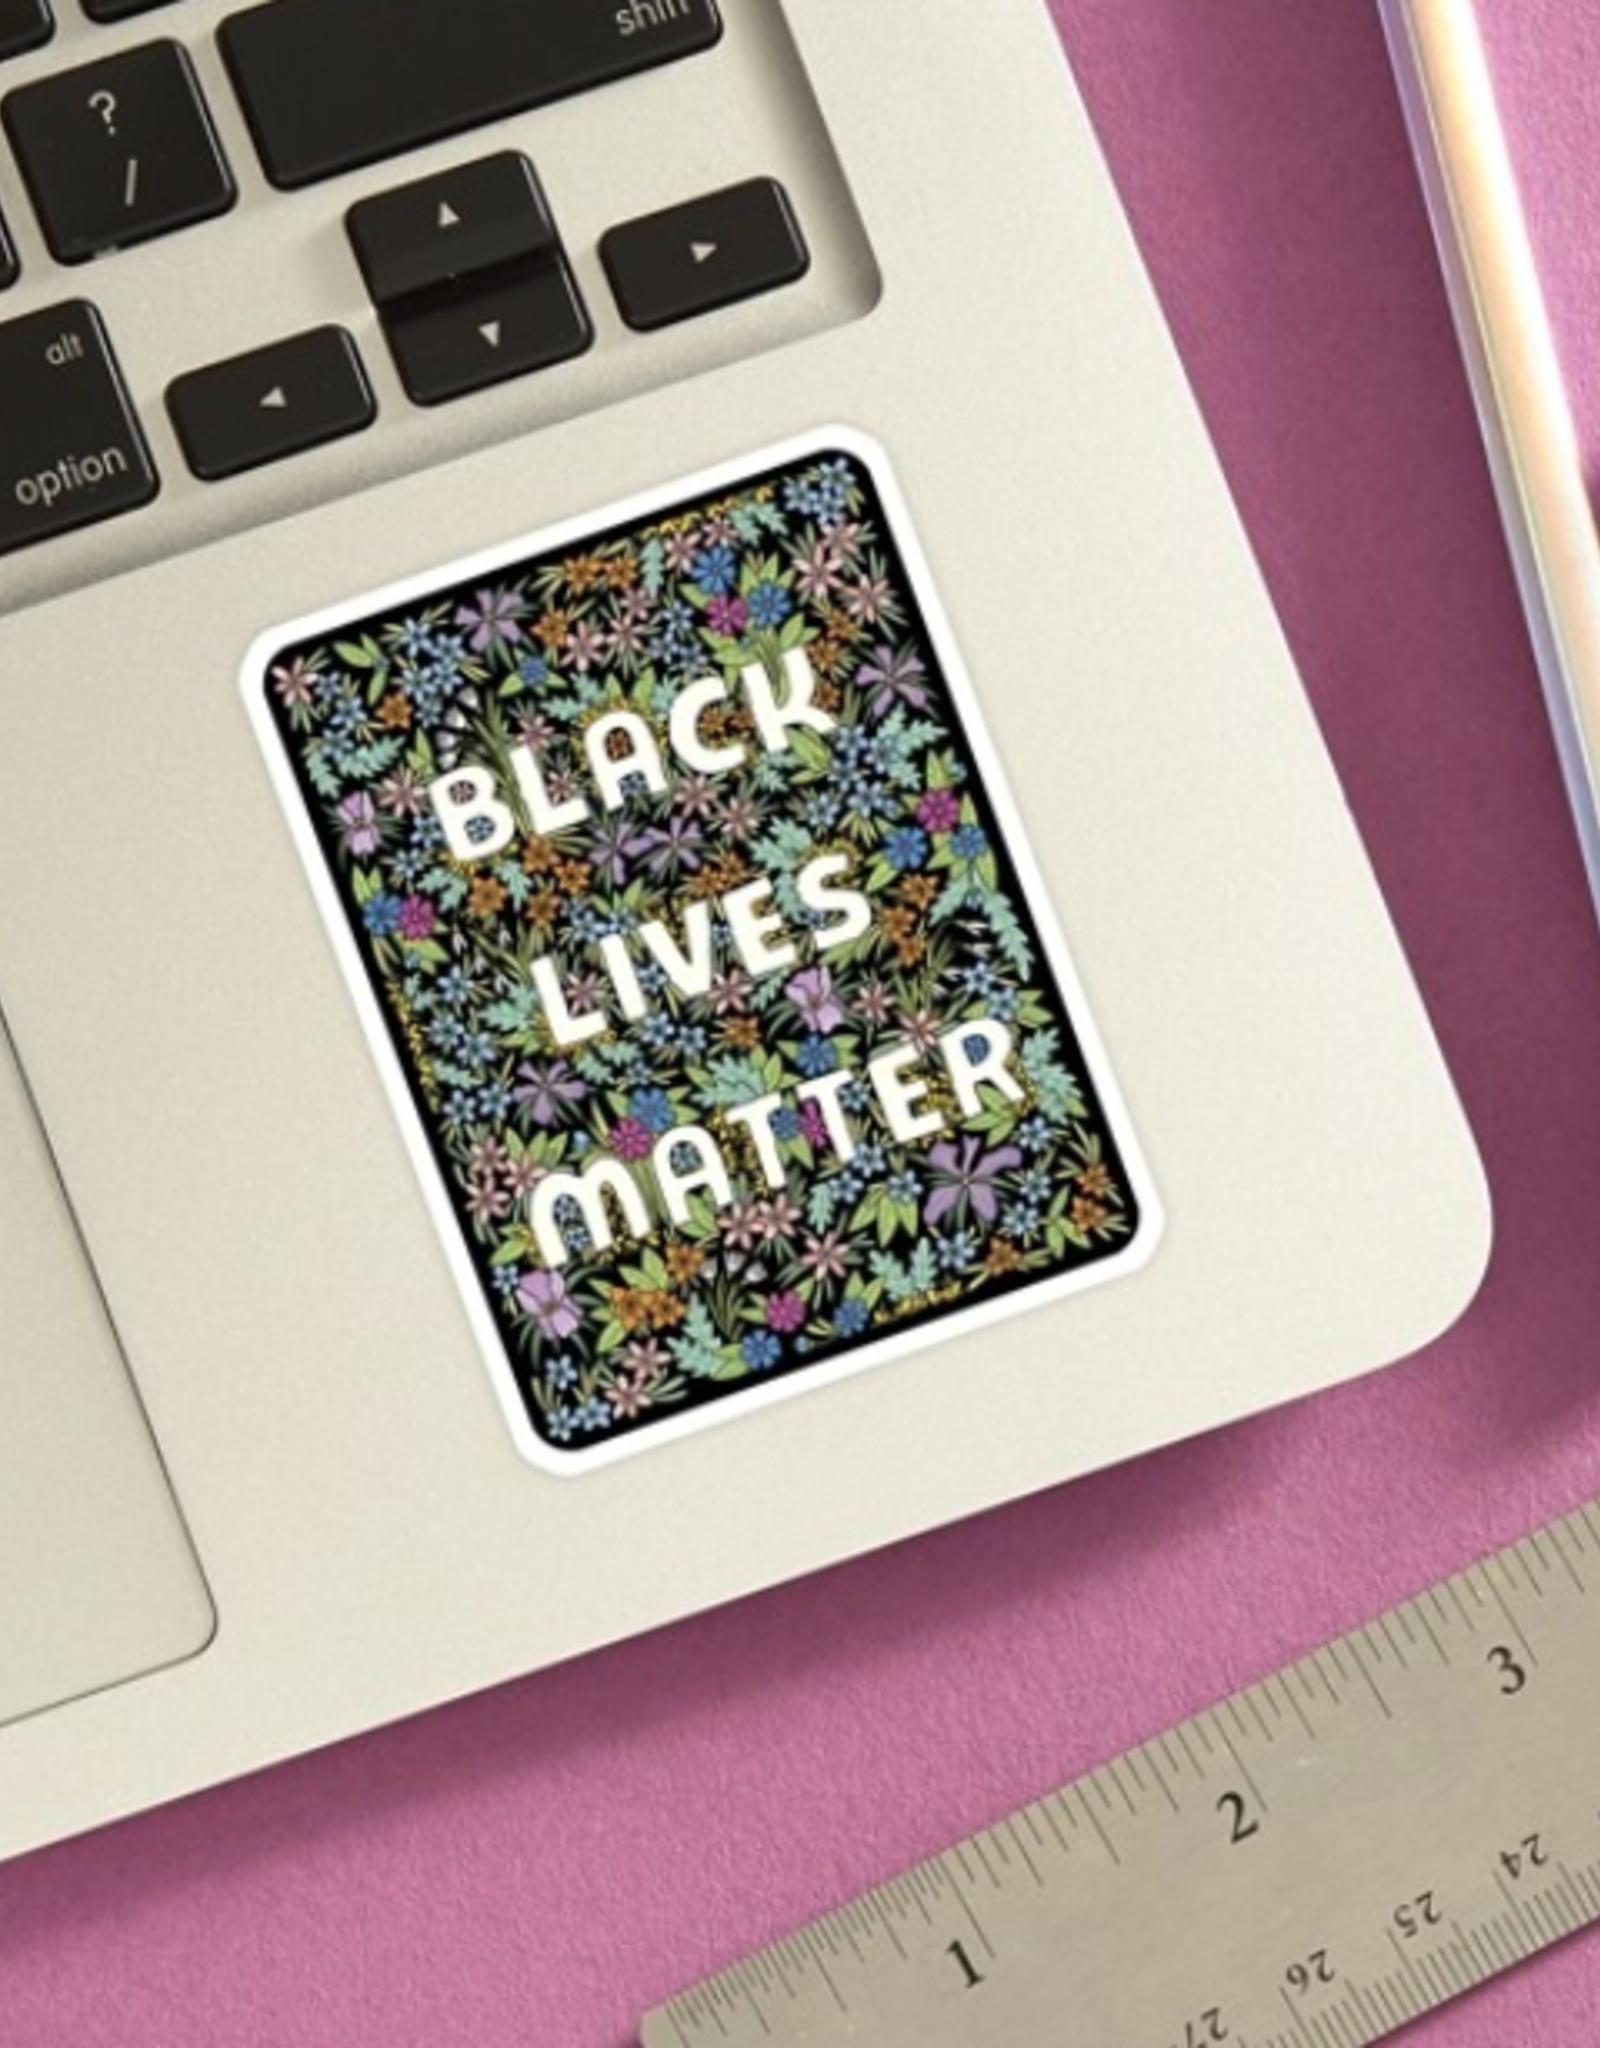 The Found Sticker: Black Lives Matter Black flower